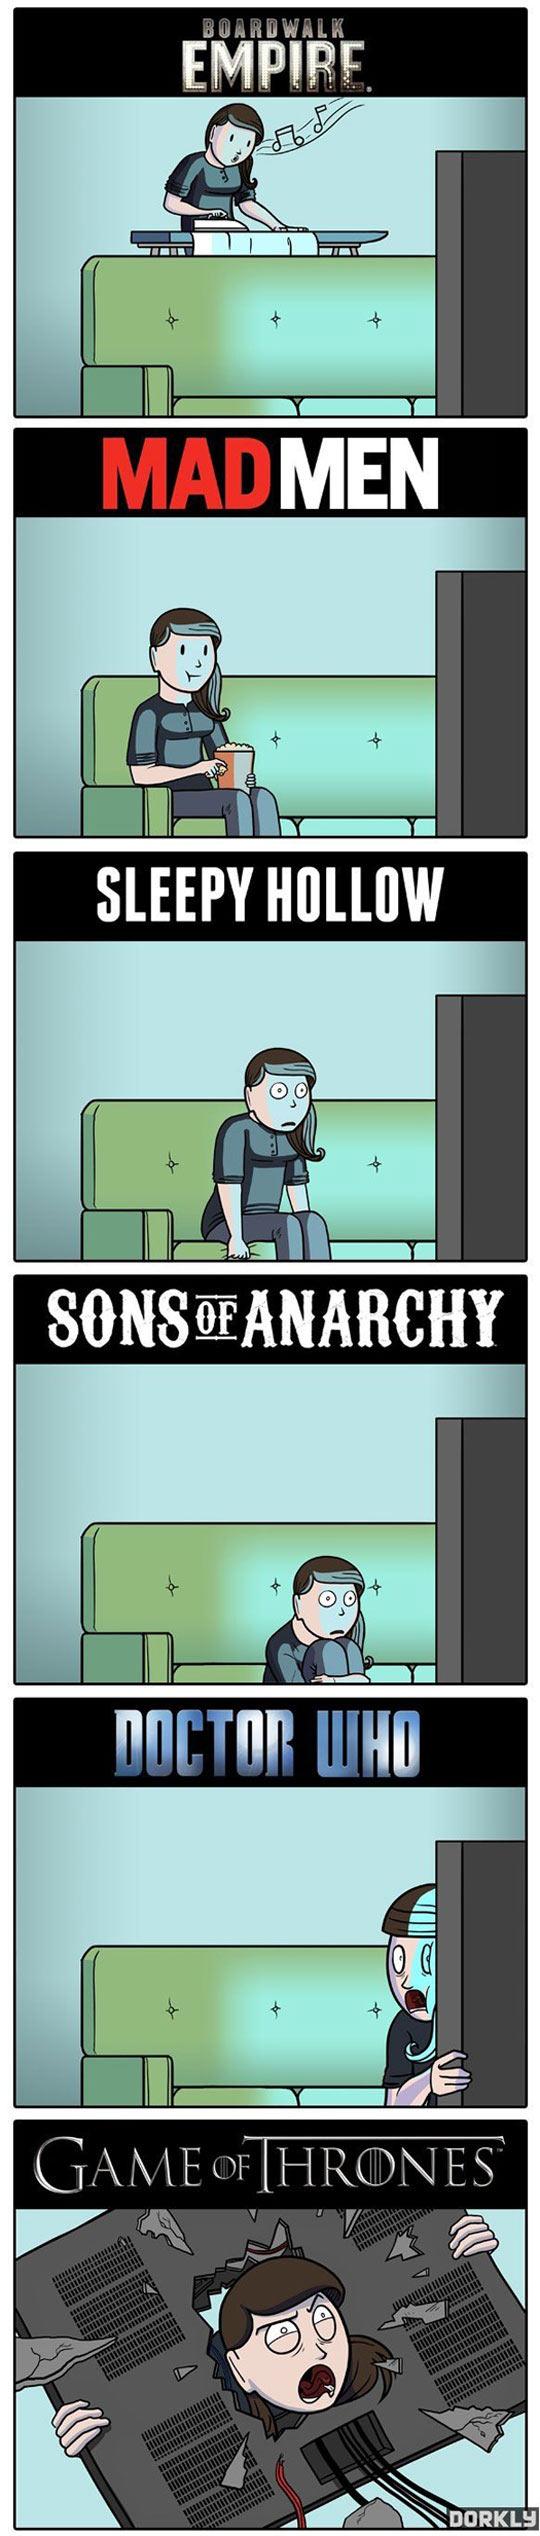 cool-webcomic-intense-TV-show